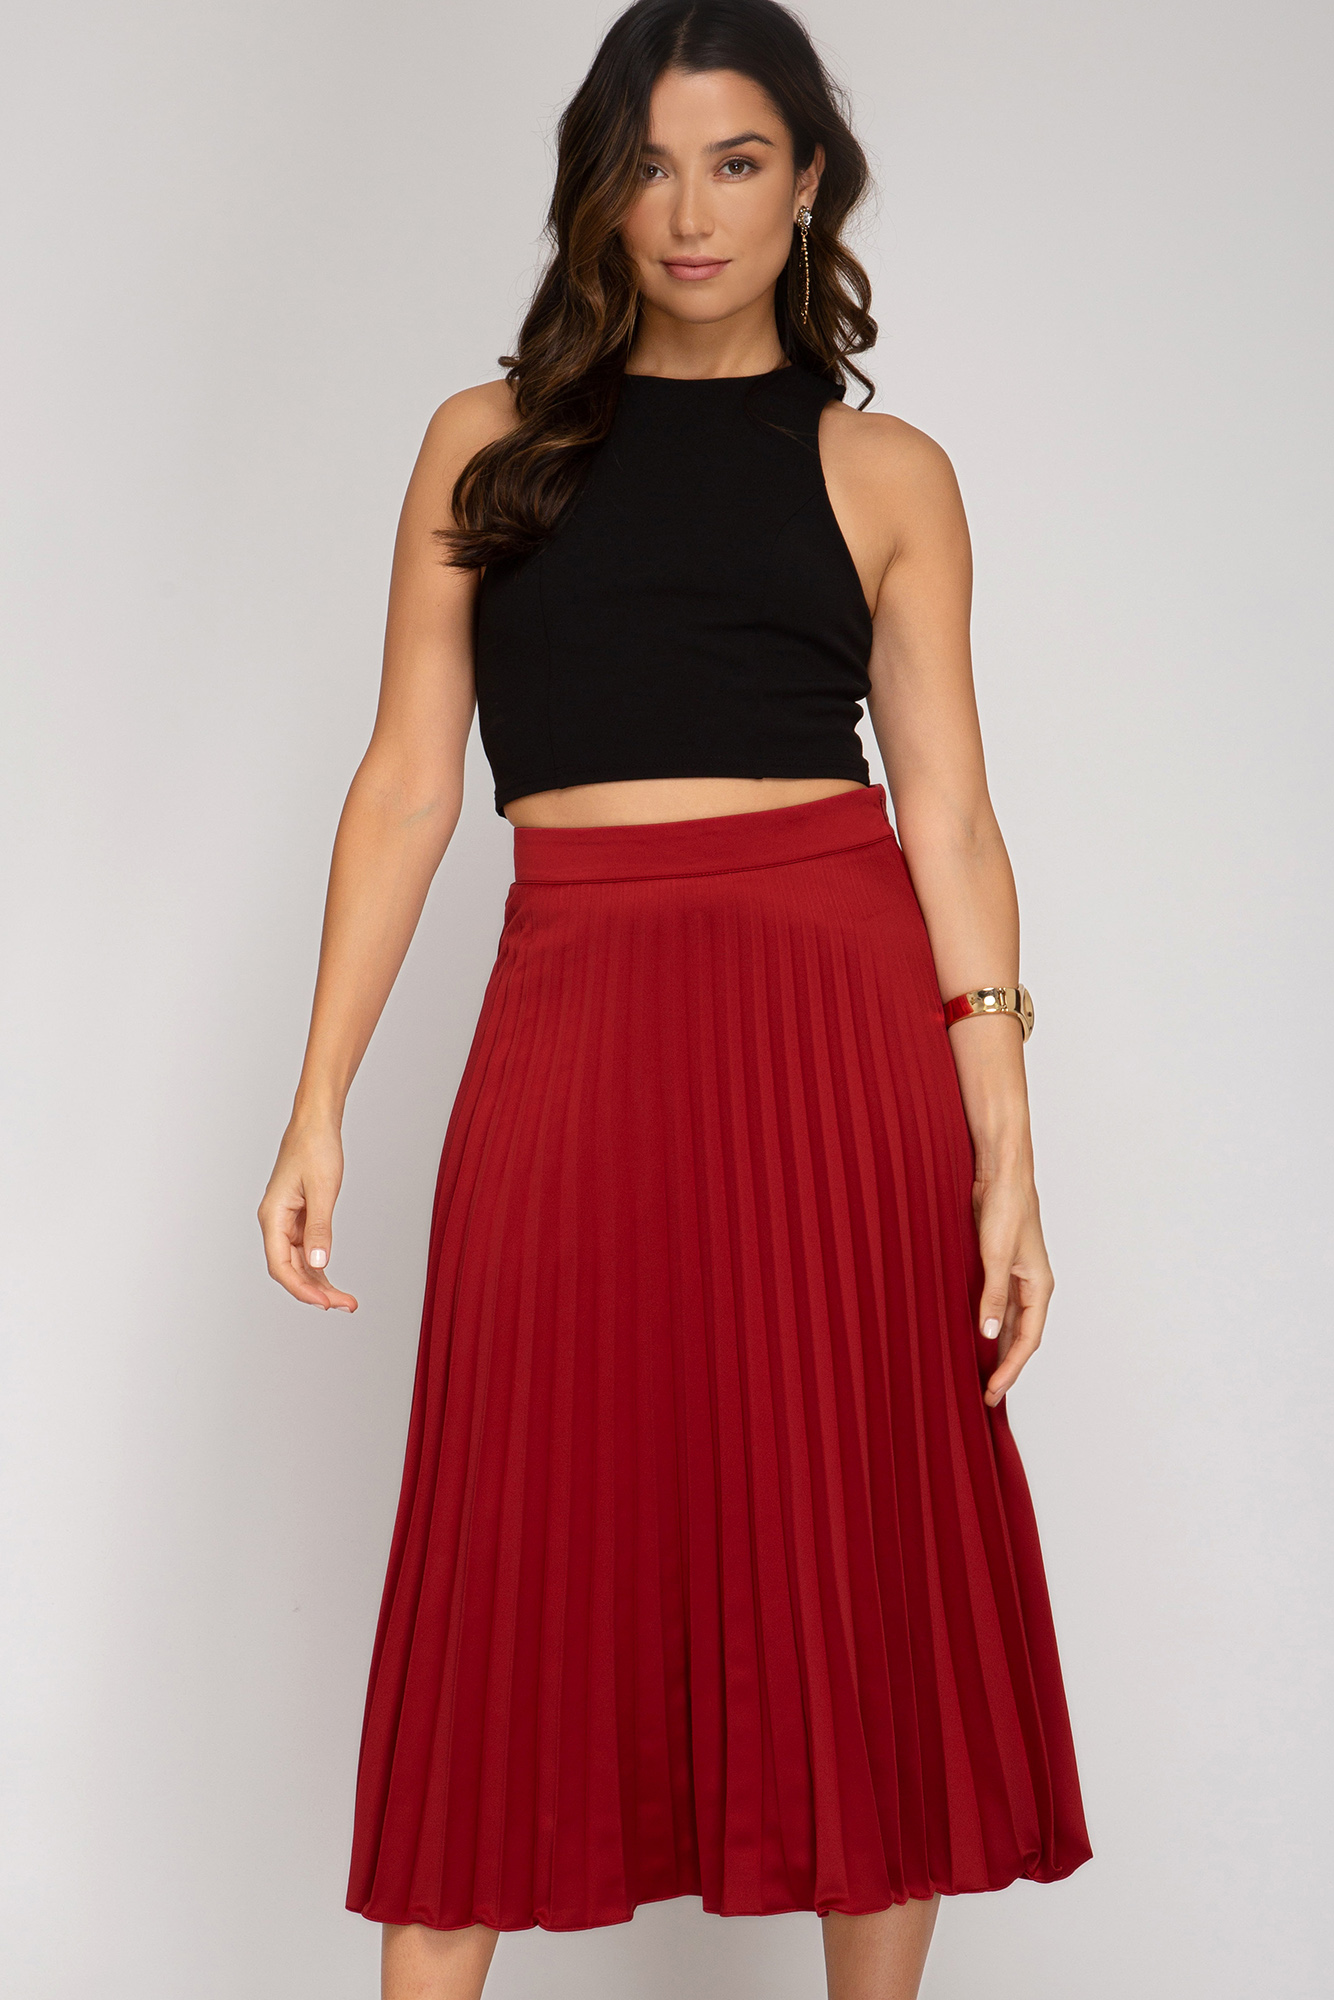 Pleated Satin Midi Skirt from She & Sky